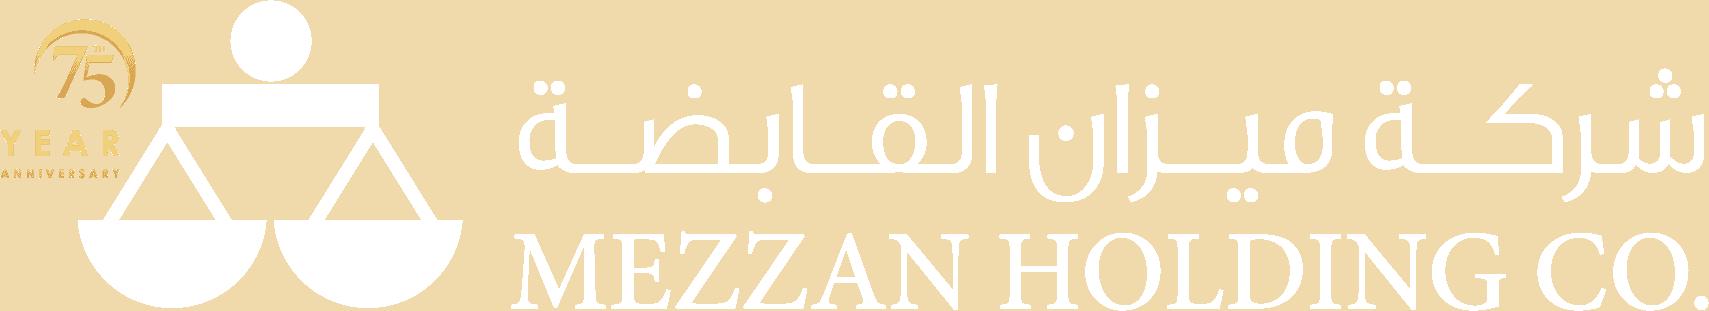 Mezzan is a Consumer and Healthcare Distribution Company